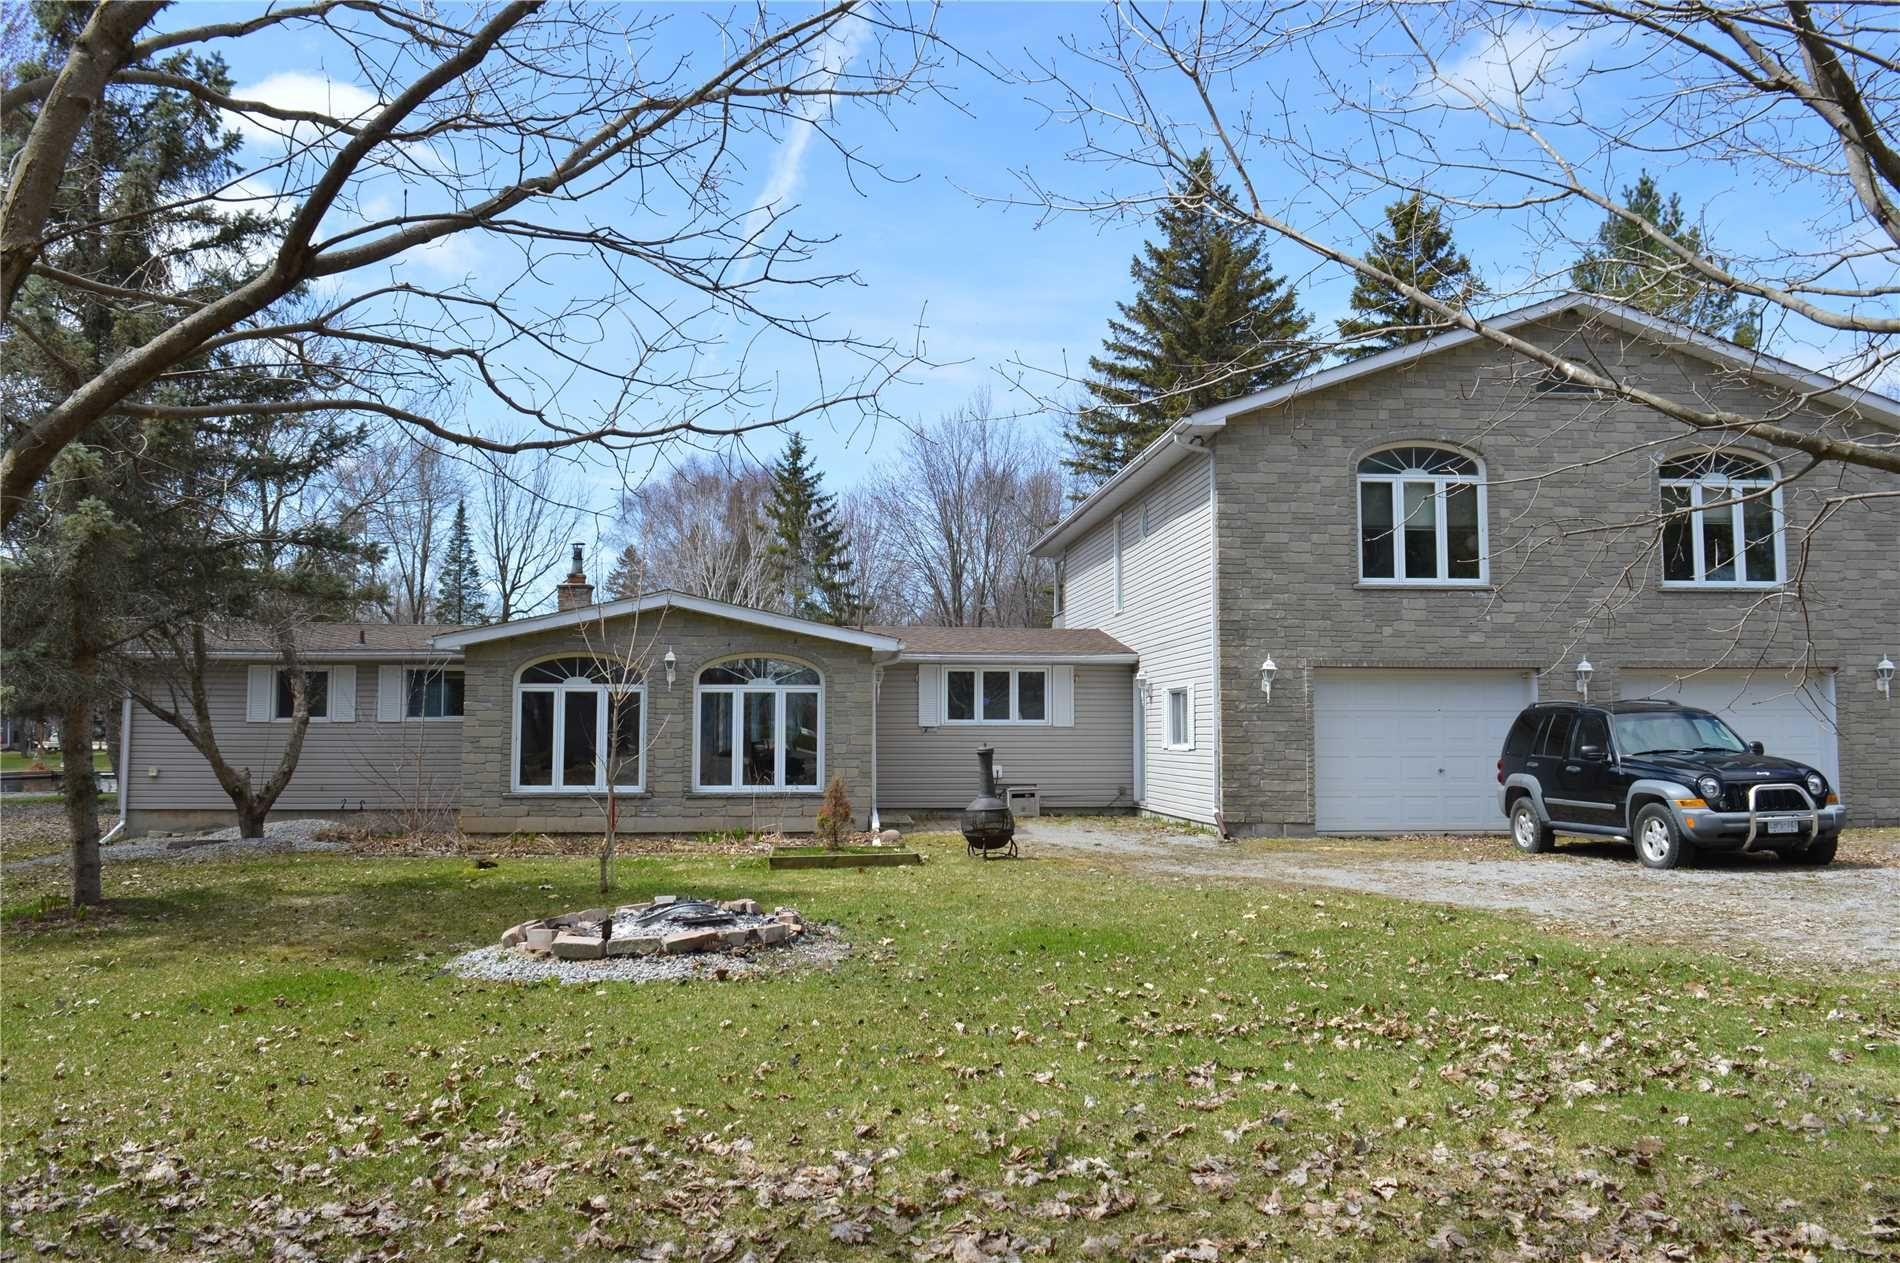 Main Photo:  in Ramara: Brechin House (2-Storey) for sale : MLS®# S4446201